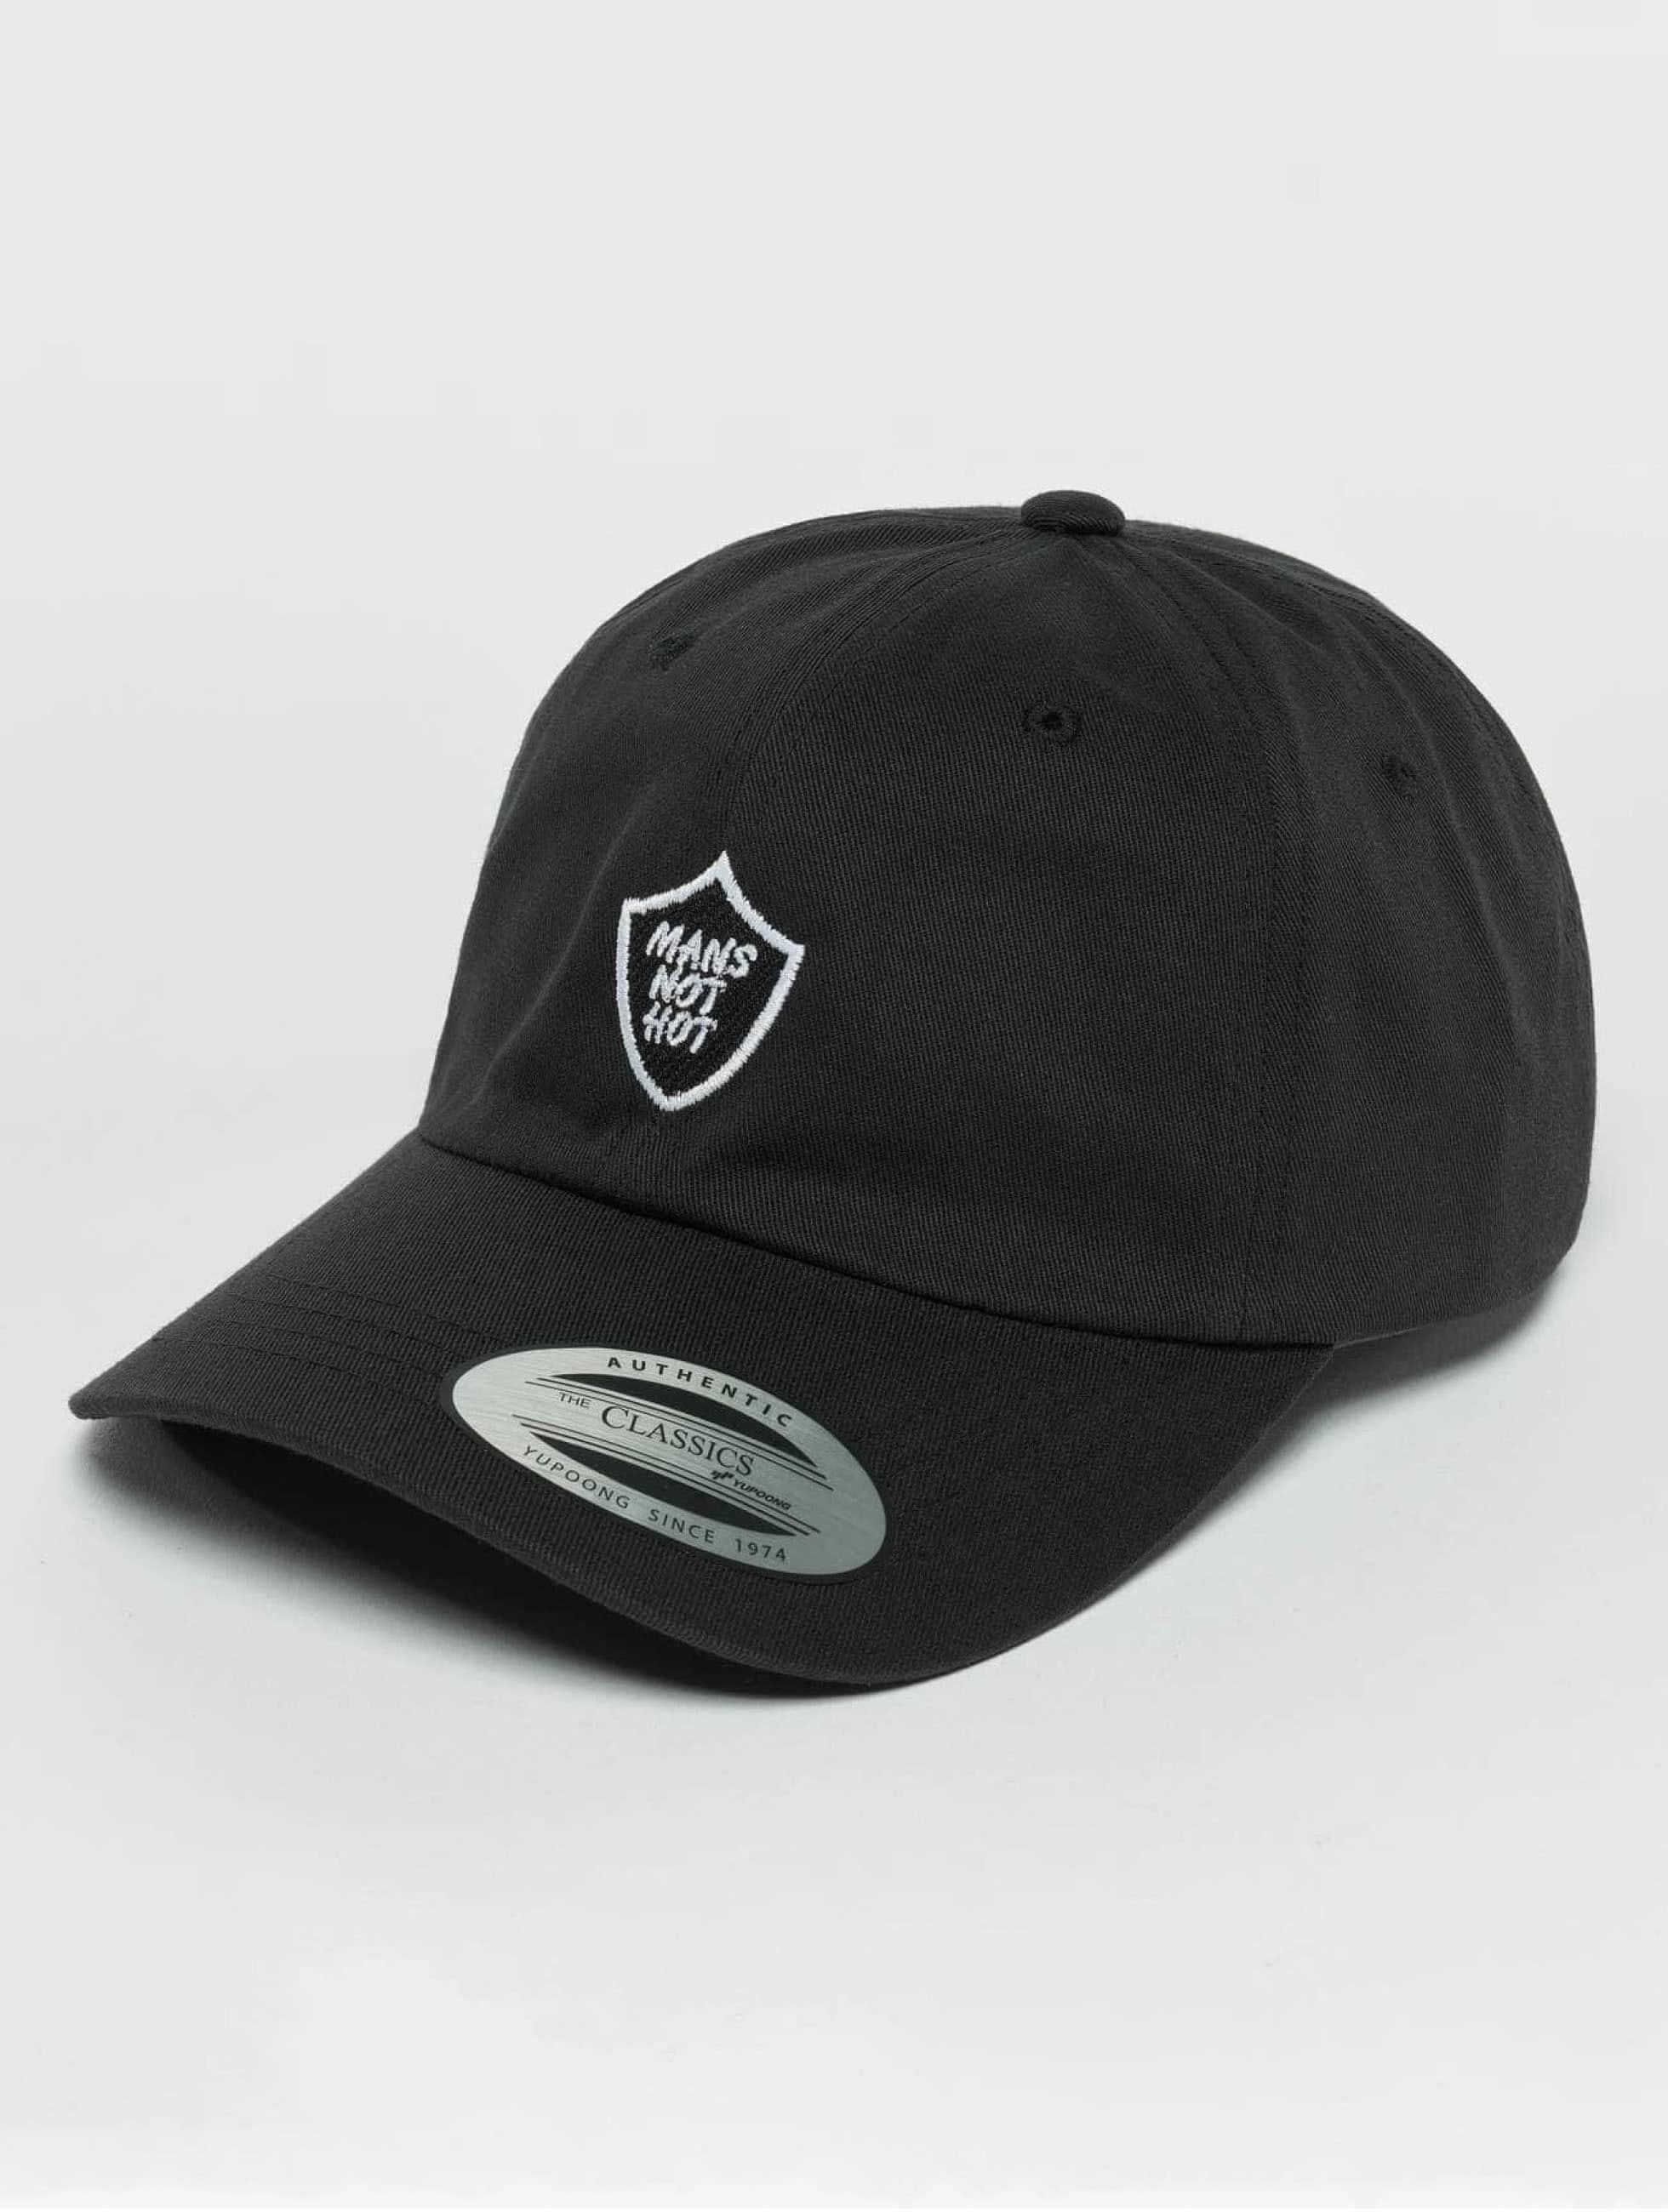 TurnUP snapback cap Not Hot zwart